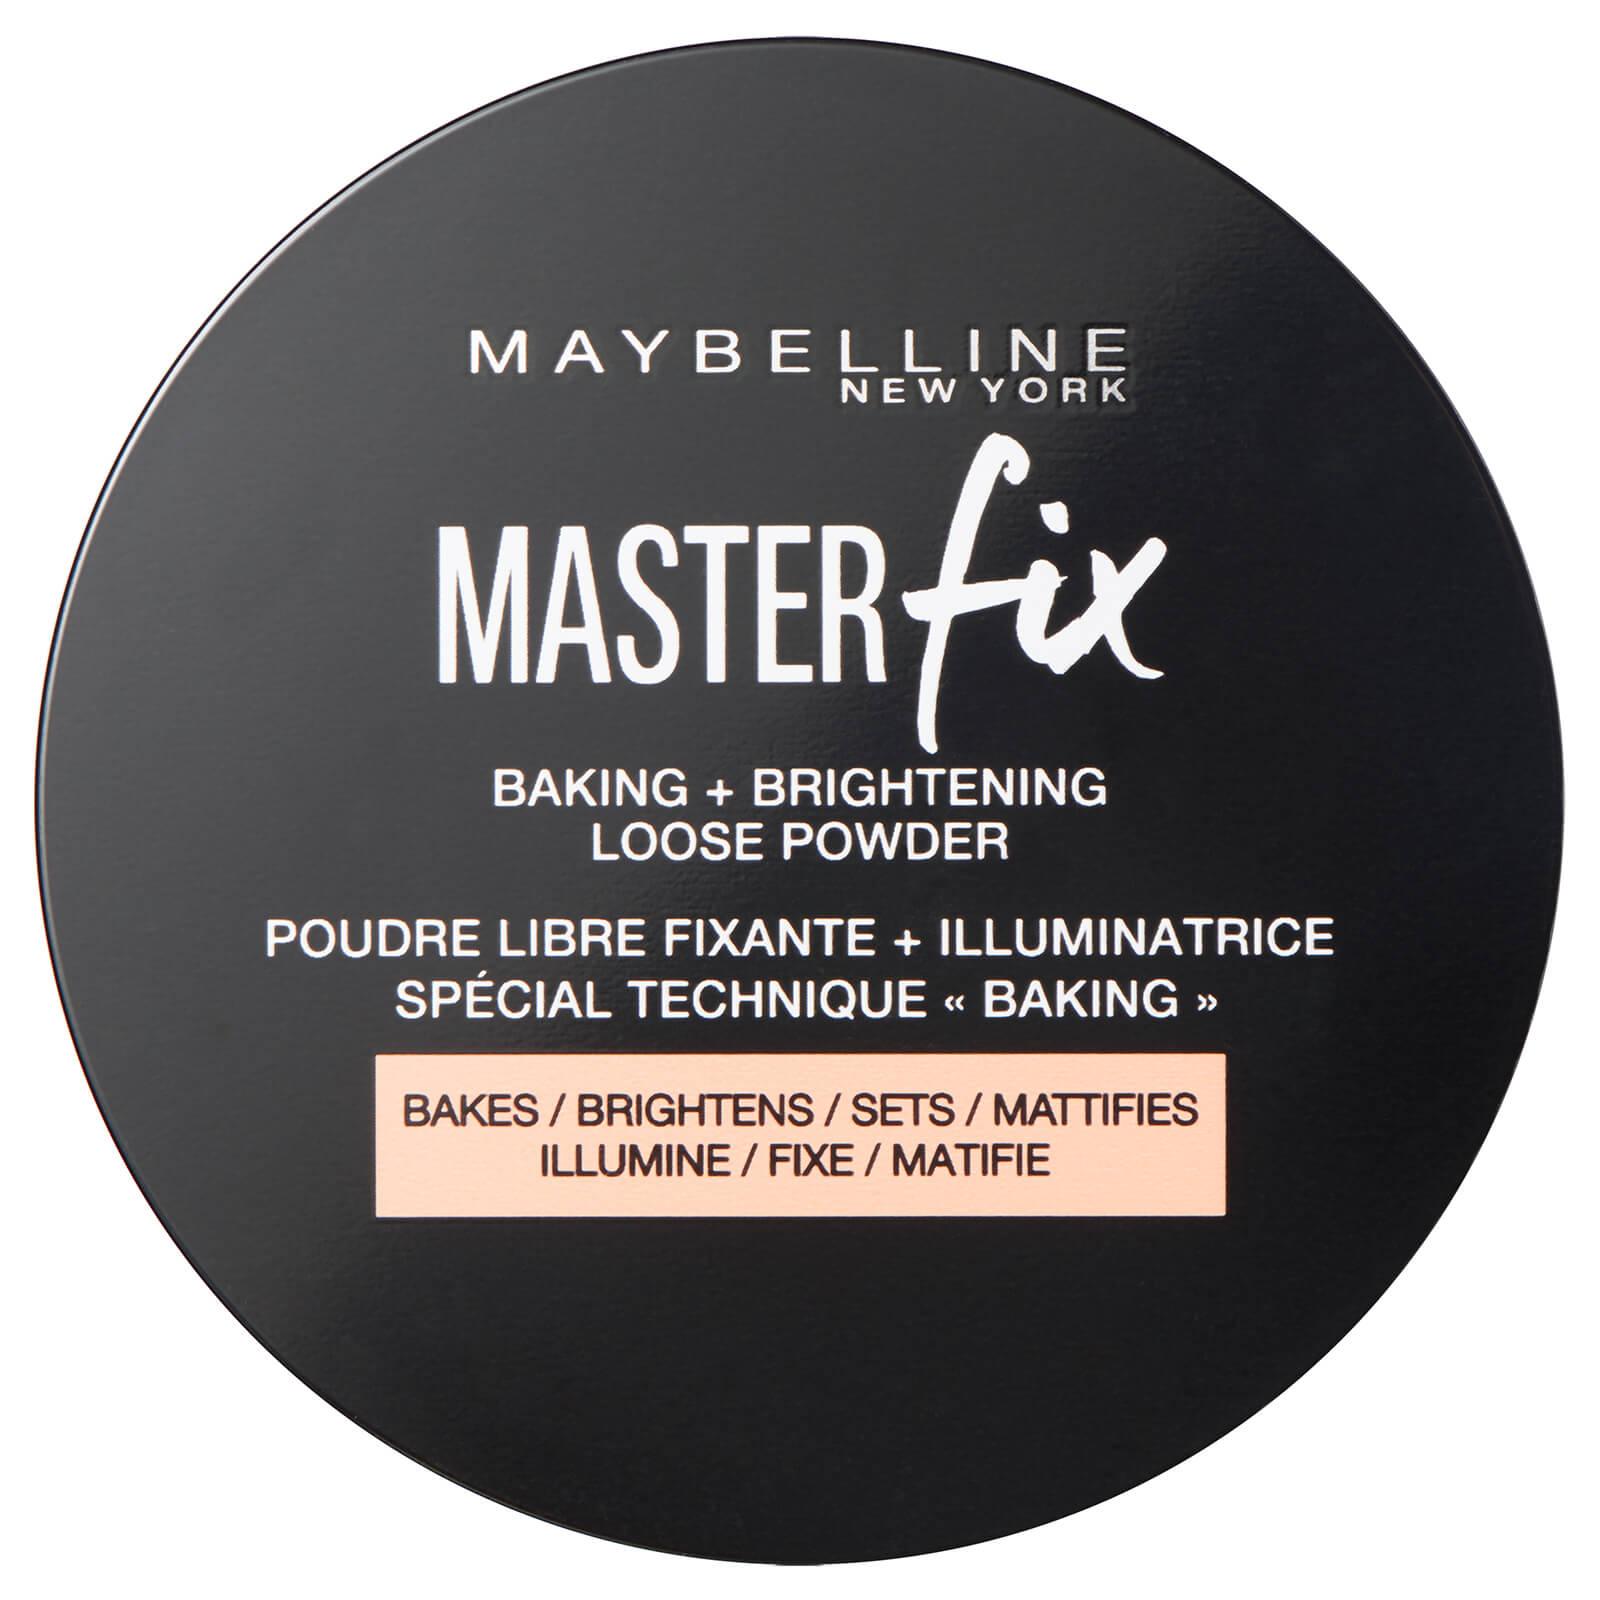 Купить Maybelline Face Studio Loose Setting Powder Banana (6g) - Banana